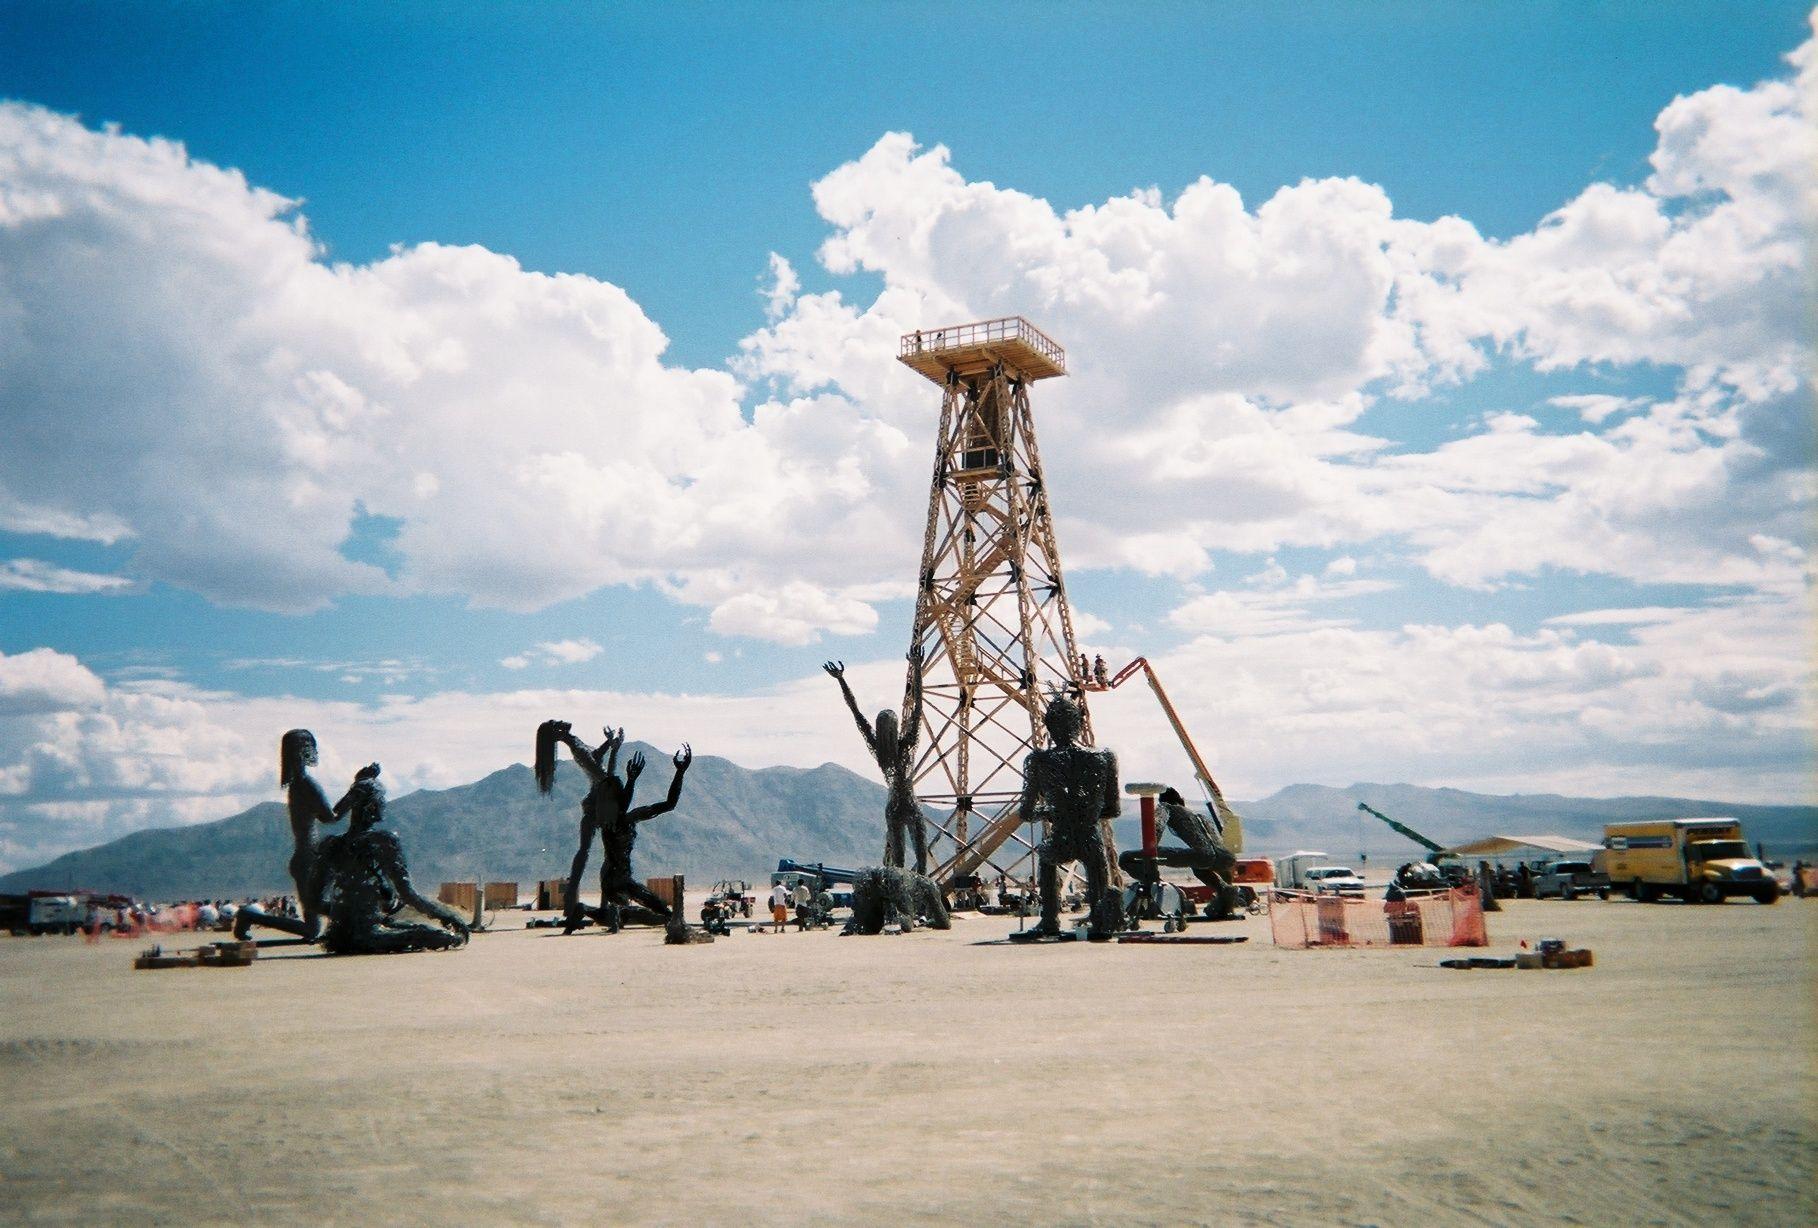 Art Burning Man Black Rock City Nevada